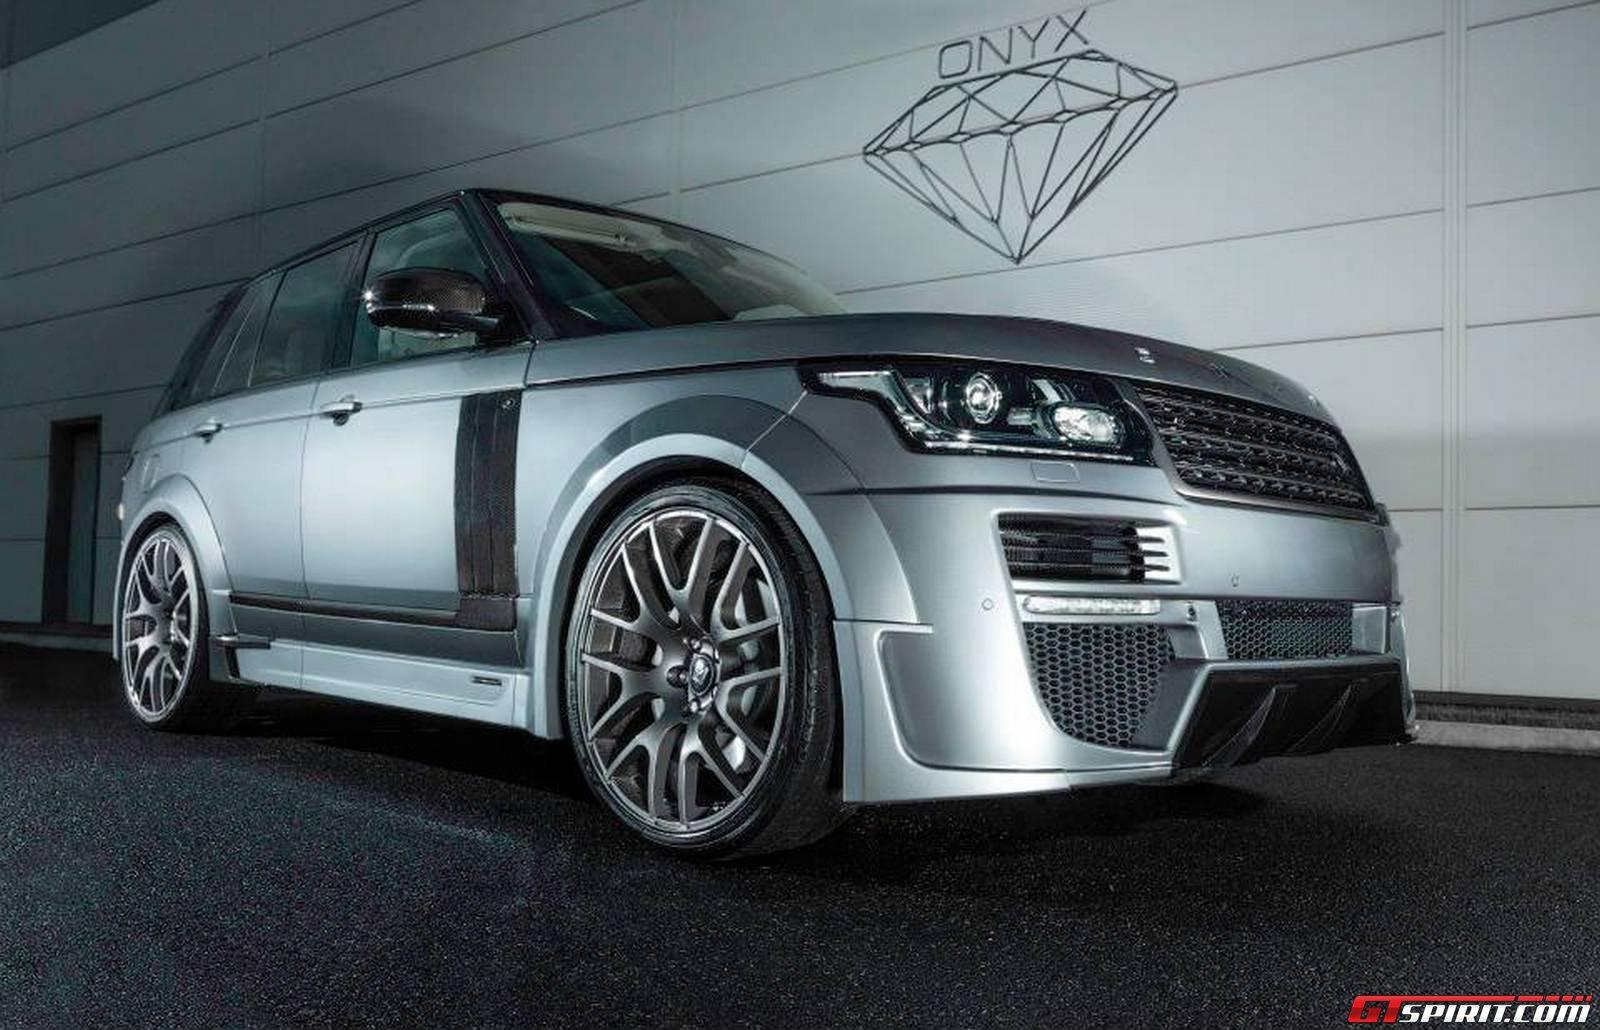 http://www.gtspirit.com/wp-content/gallery/range-rover-aspen-ultimate-series/range-rover-aspen-ultimate-series-2.jpg